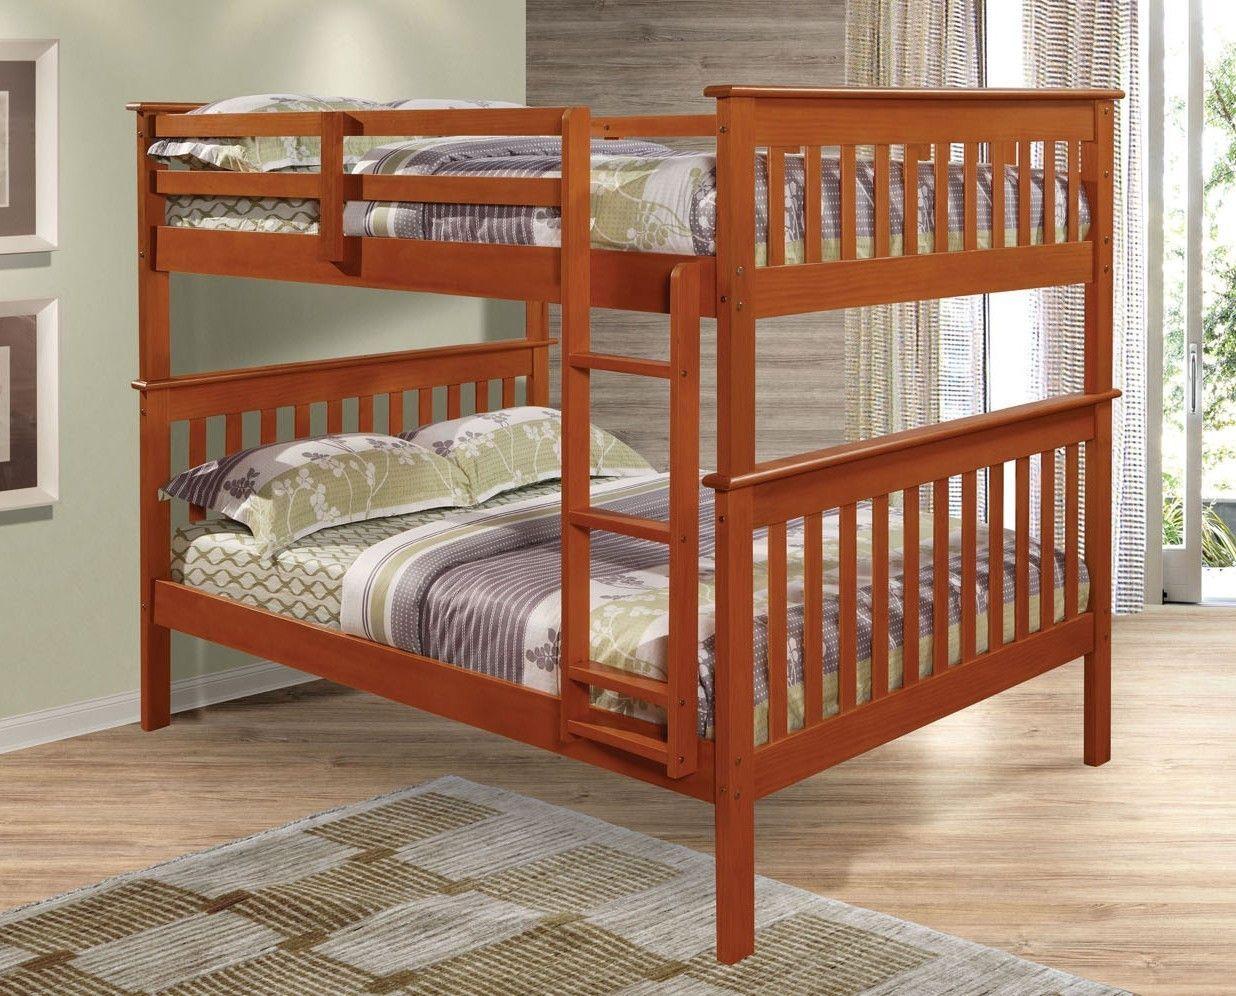 Loft over bedroom  Zachary Full over Full Espresso Bunk Beds  Full bunk beds Bunk bed